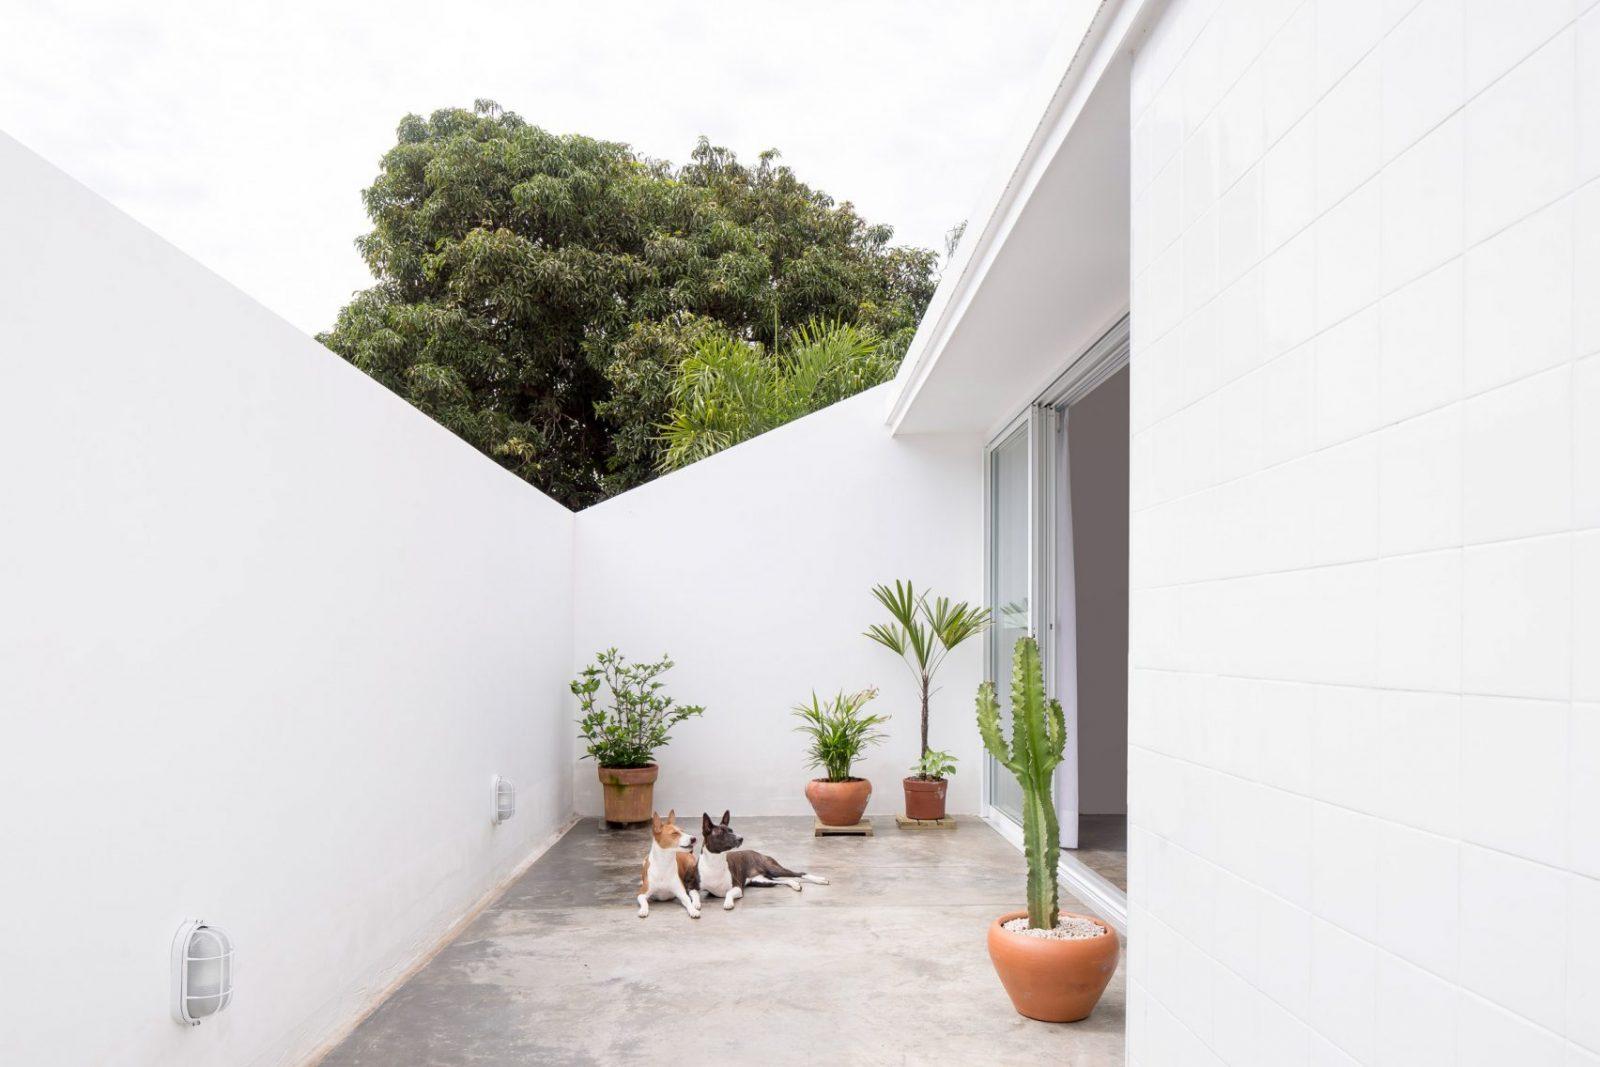 casa-711h-bloco-arquitetos-Joana-Franca-04-1600x1067